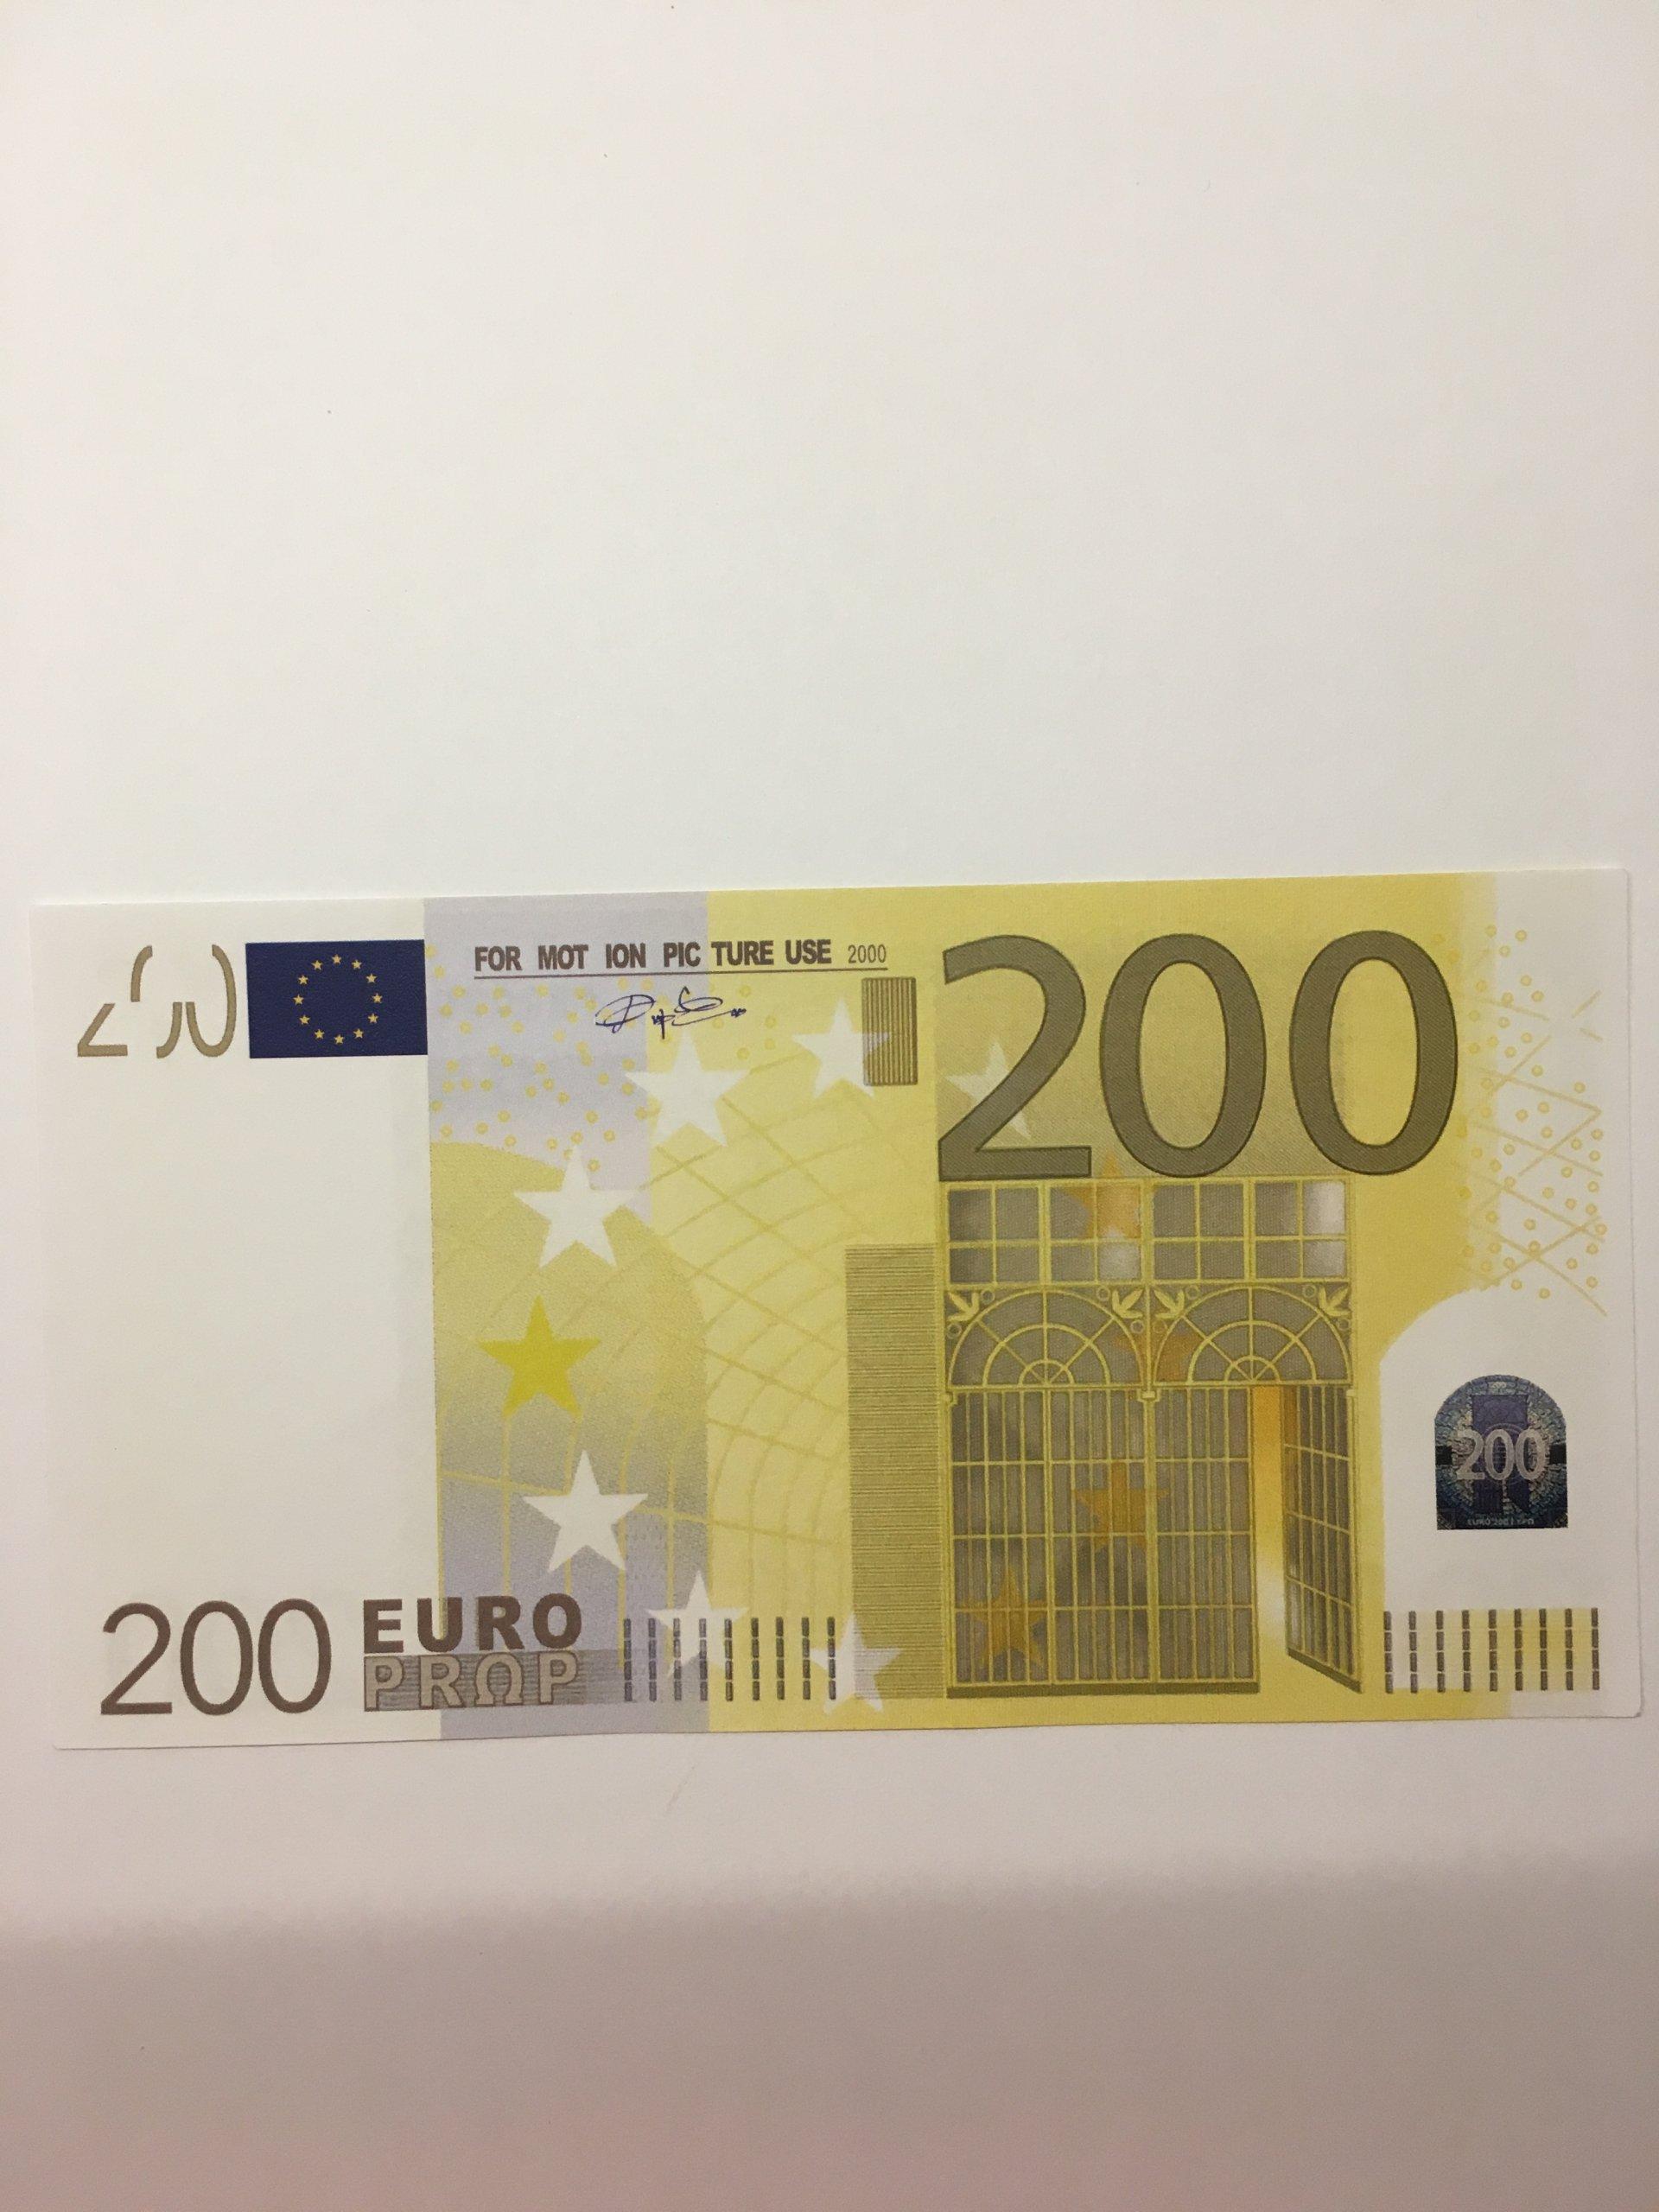 фото Евро 200 казино франк